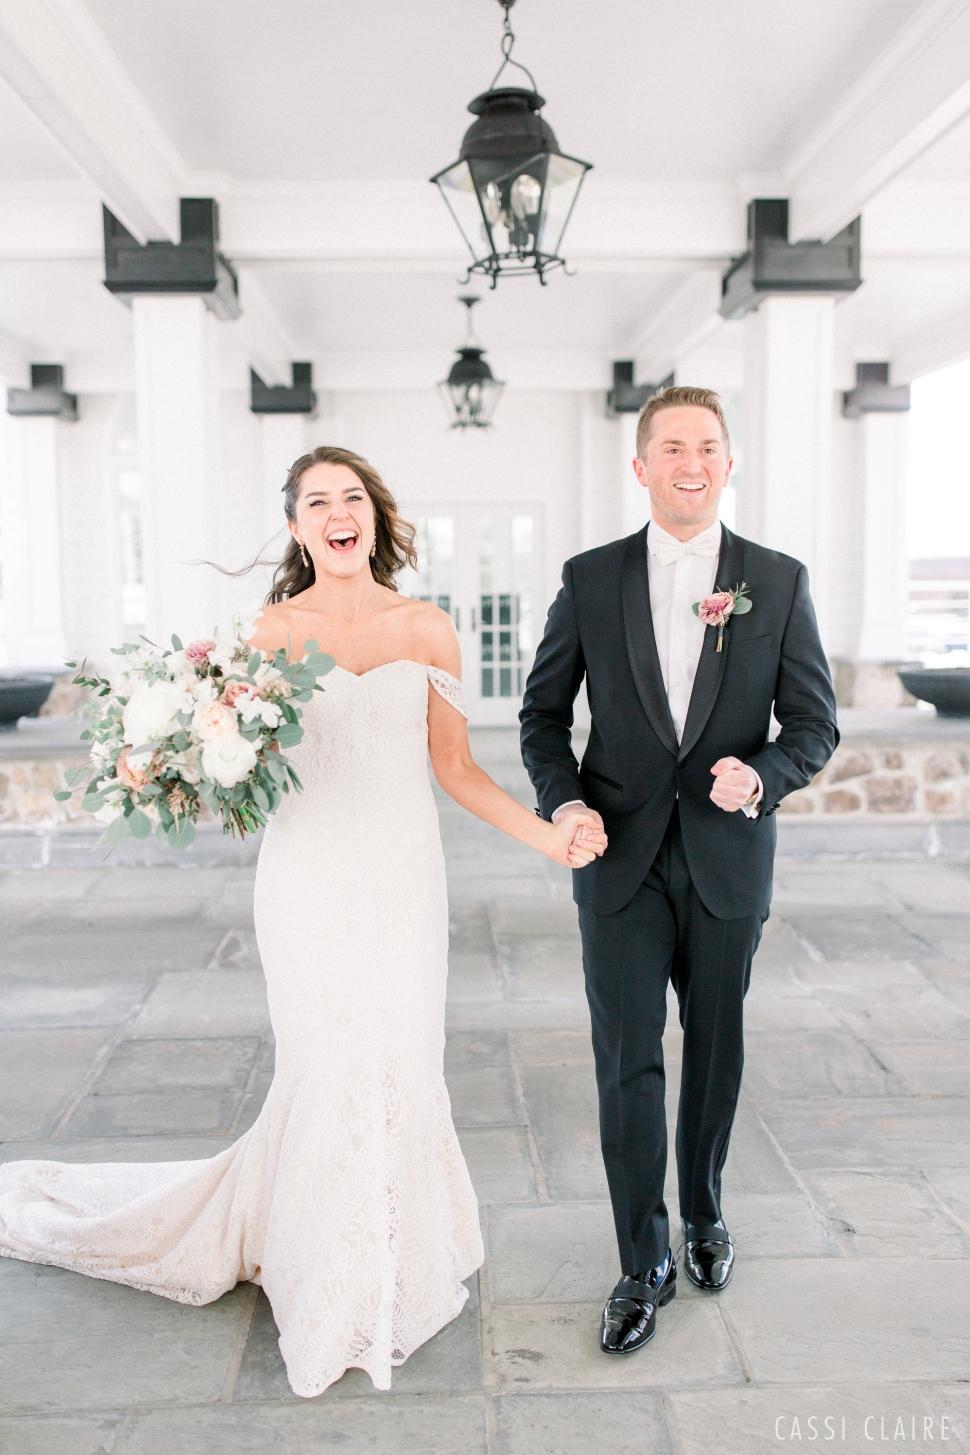 CassiClaire_Ryland-Inn-Wedding_01.jpg